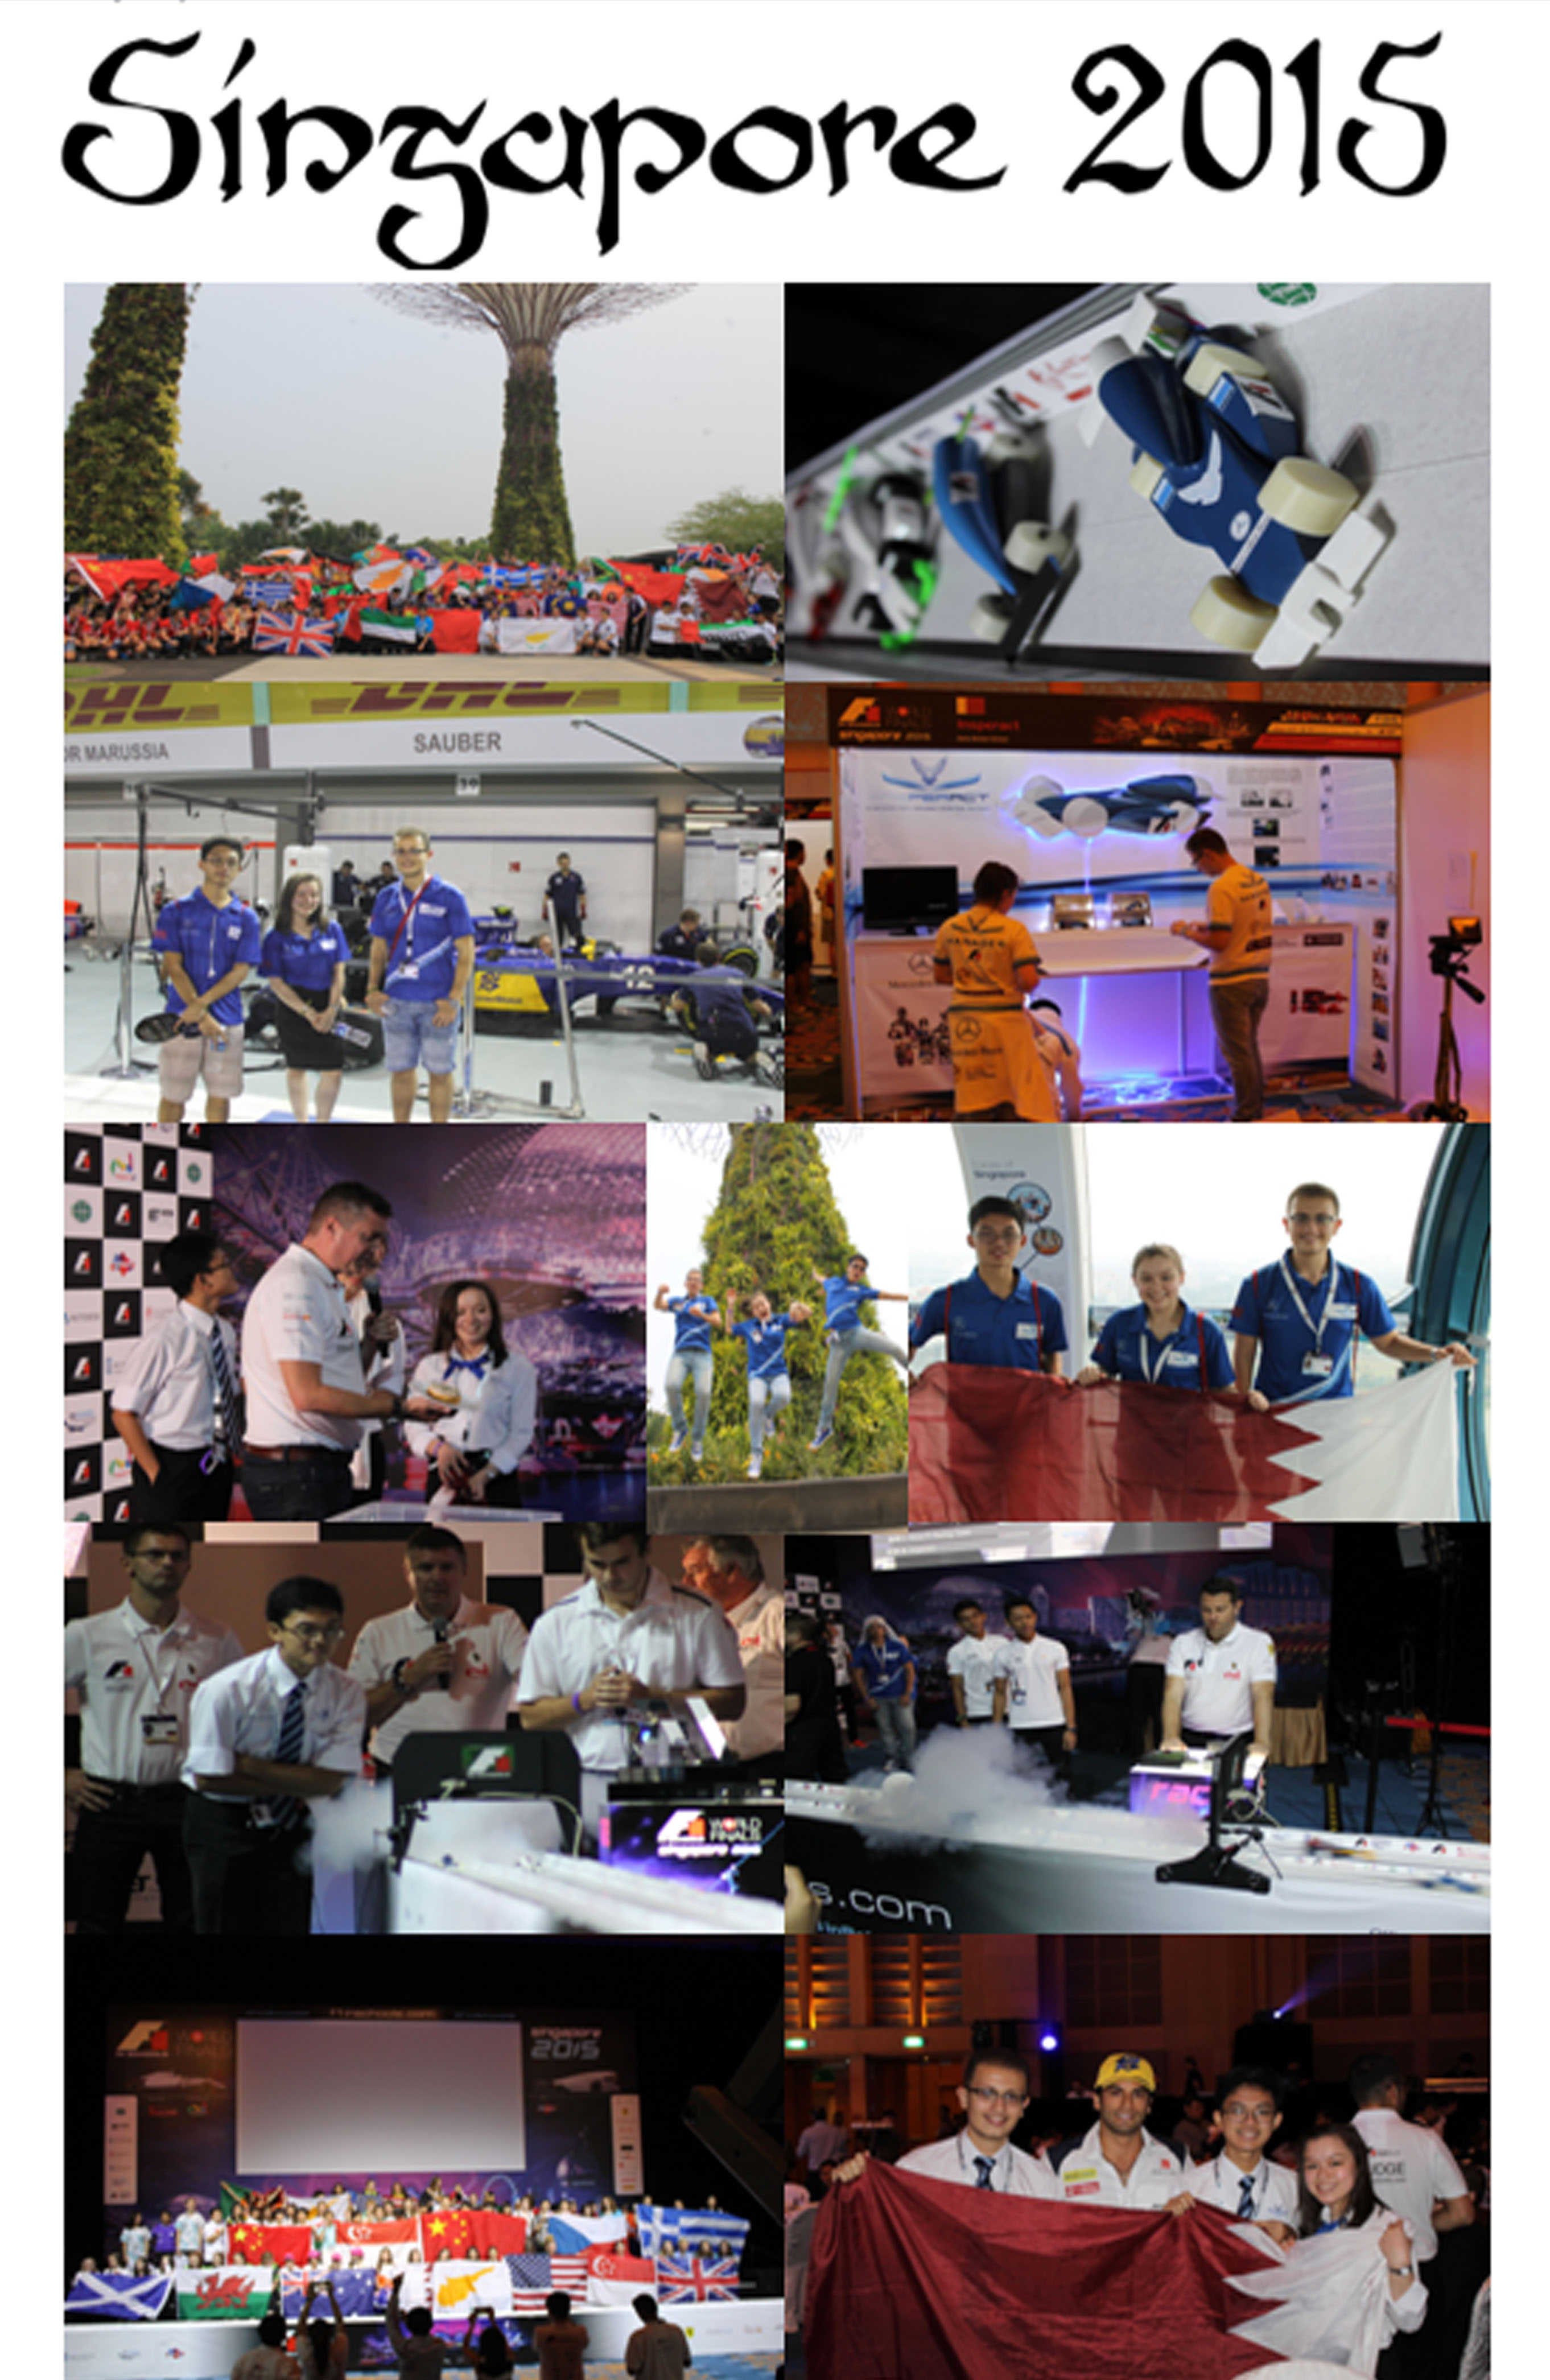 Sigapore 2015